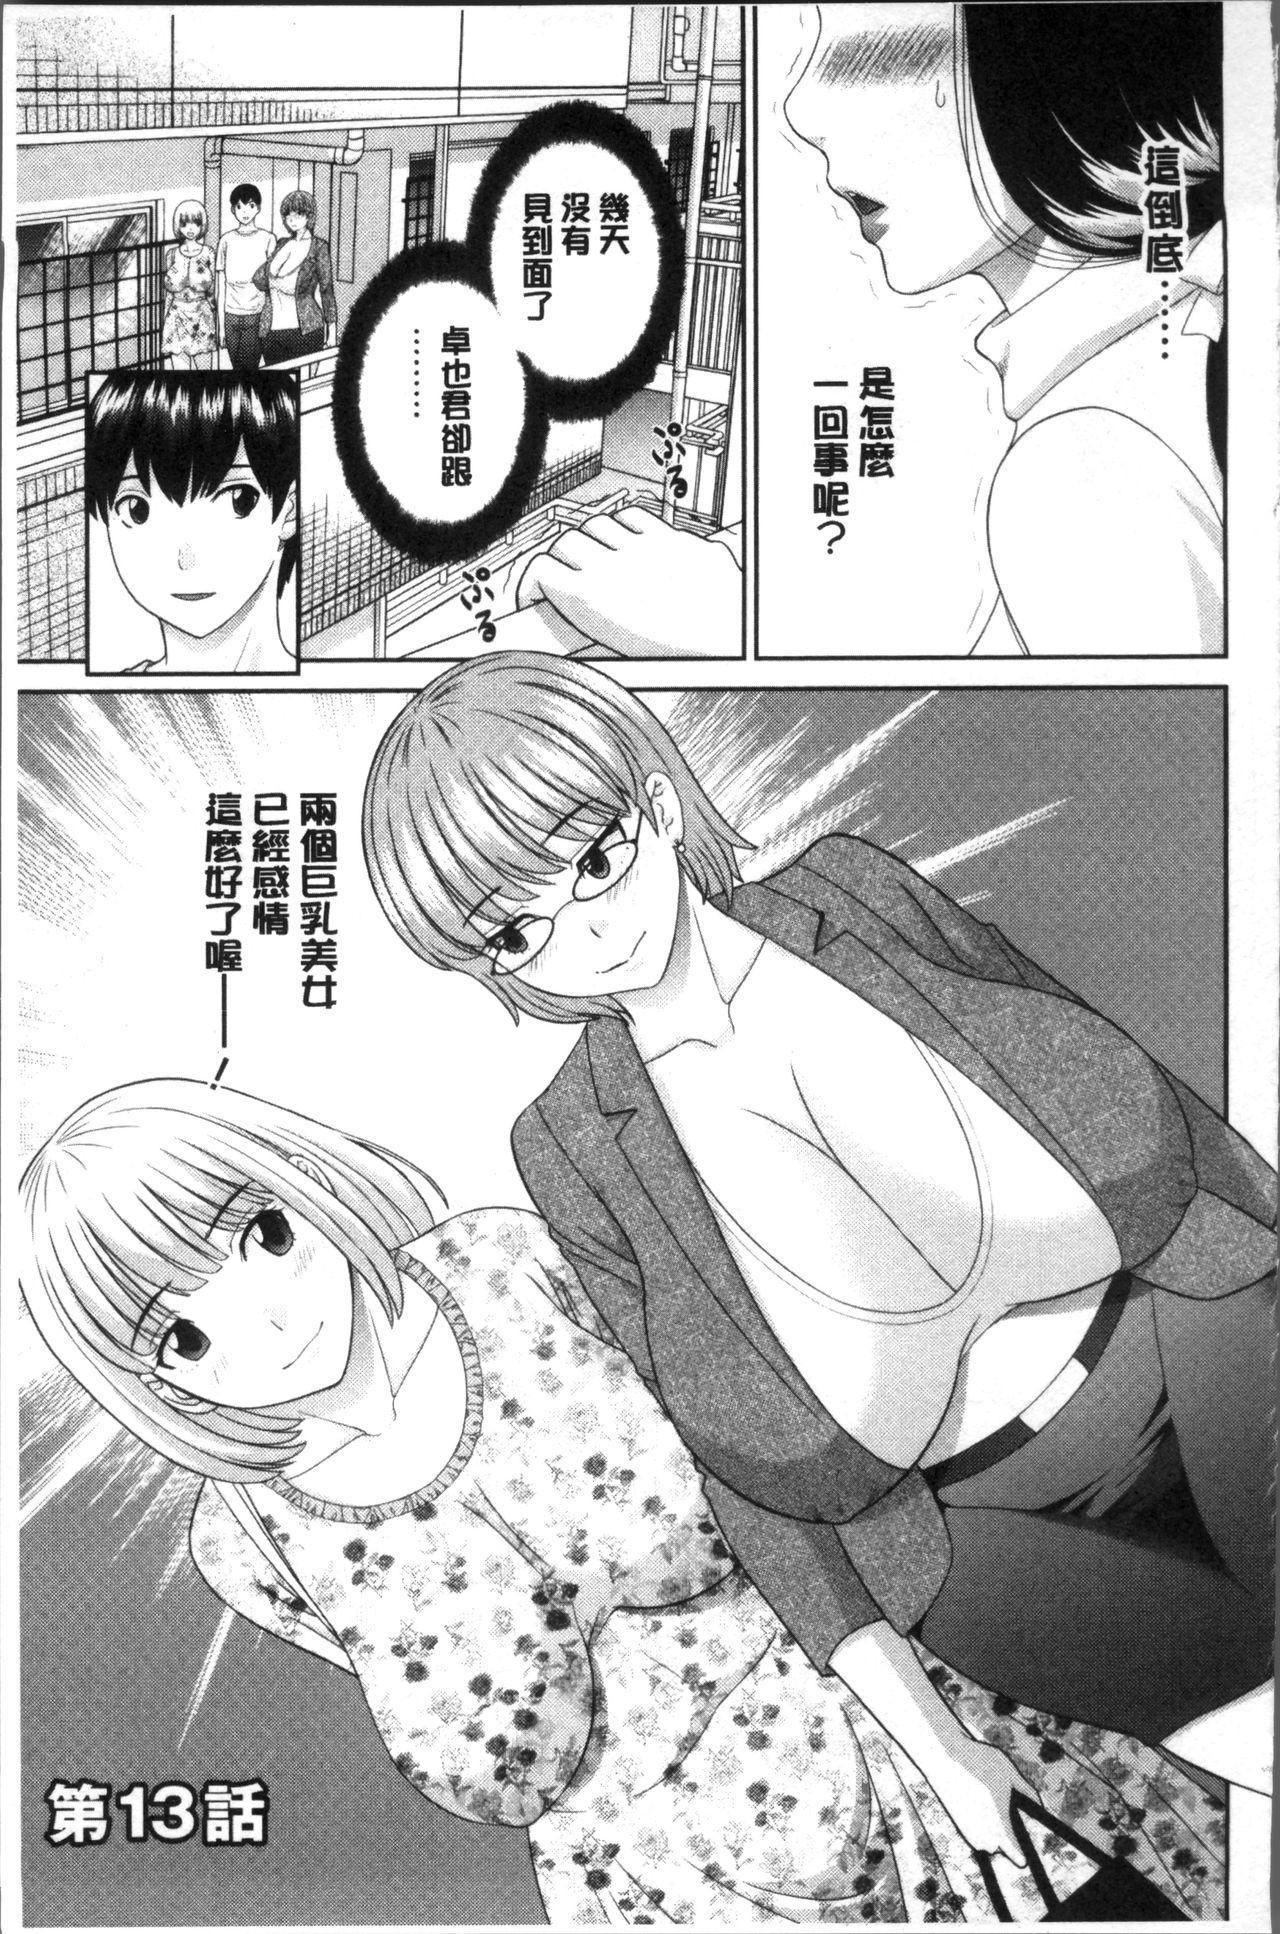 [Kawamori Misaki] Innyuu Shufu no Futei Ganbou - Oku-san to Kanojo to 2 | 淫乳主婦的不貞願望 和人妻也和女友❤2 [Chinese] 60